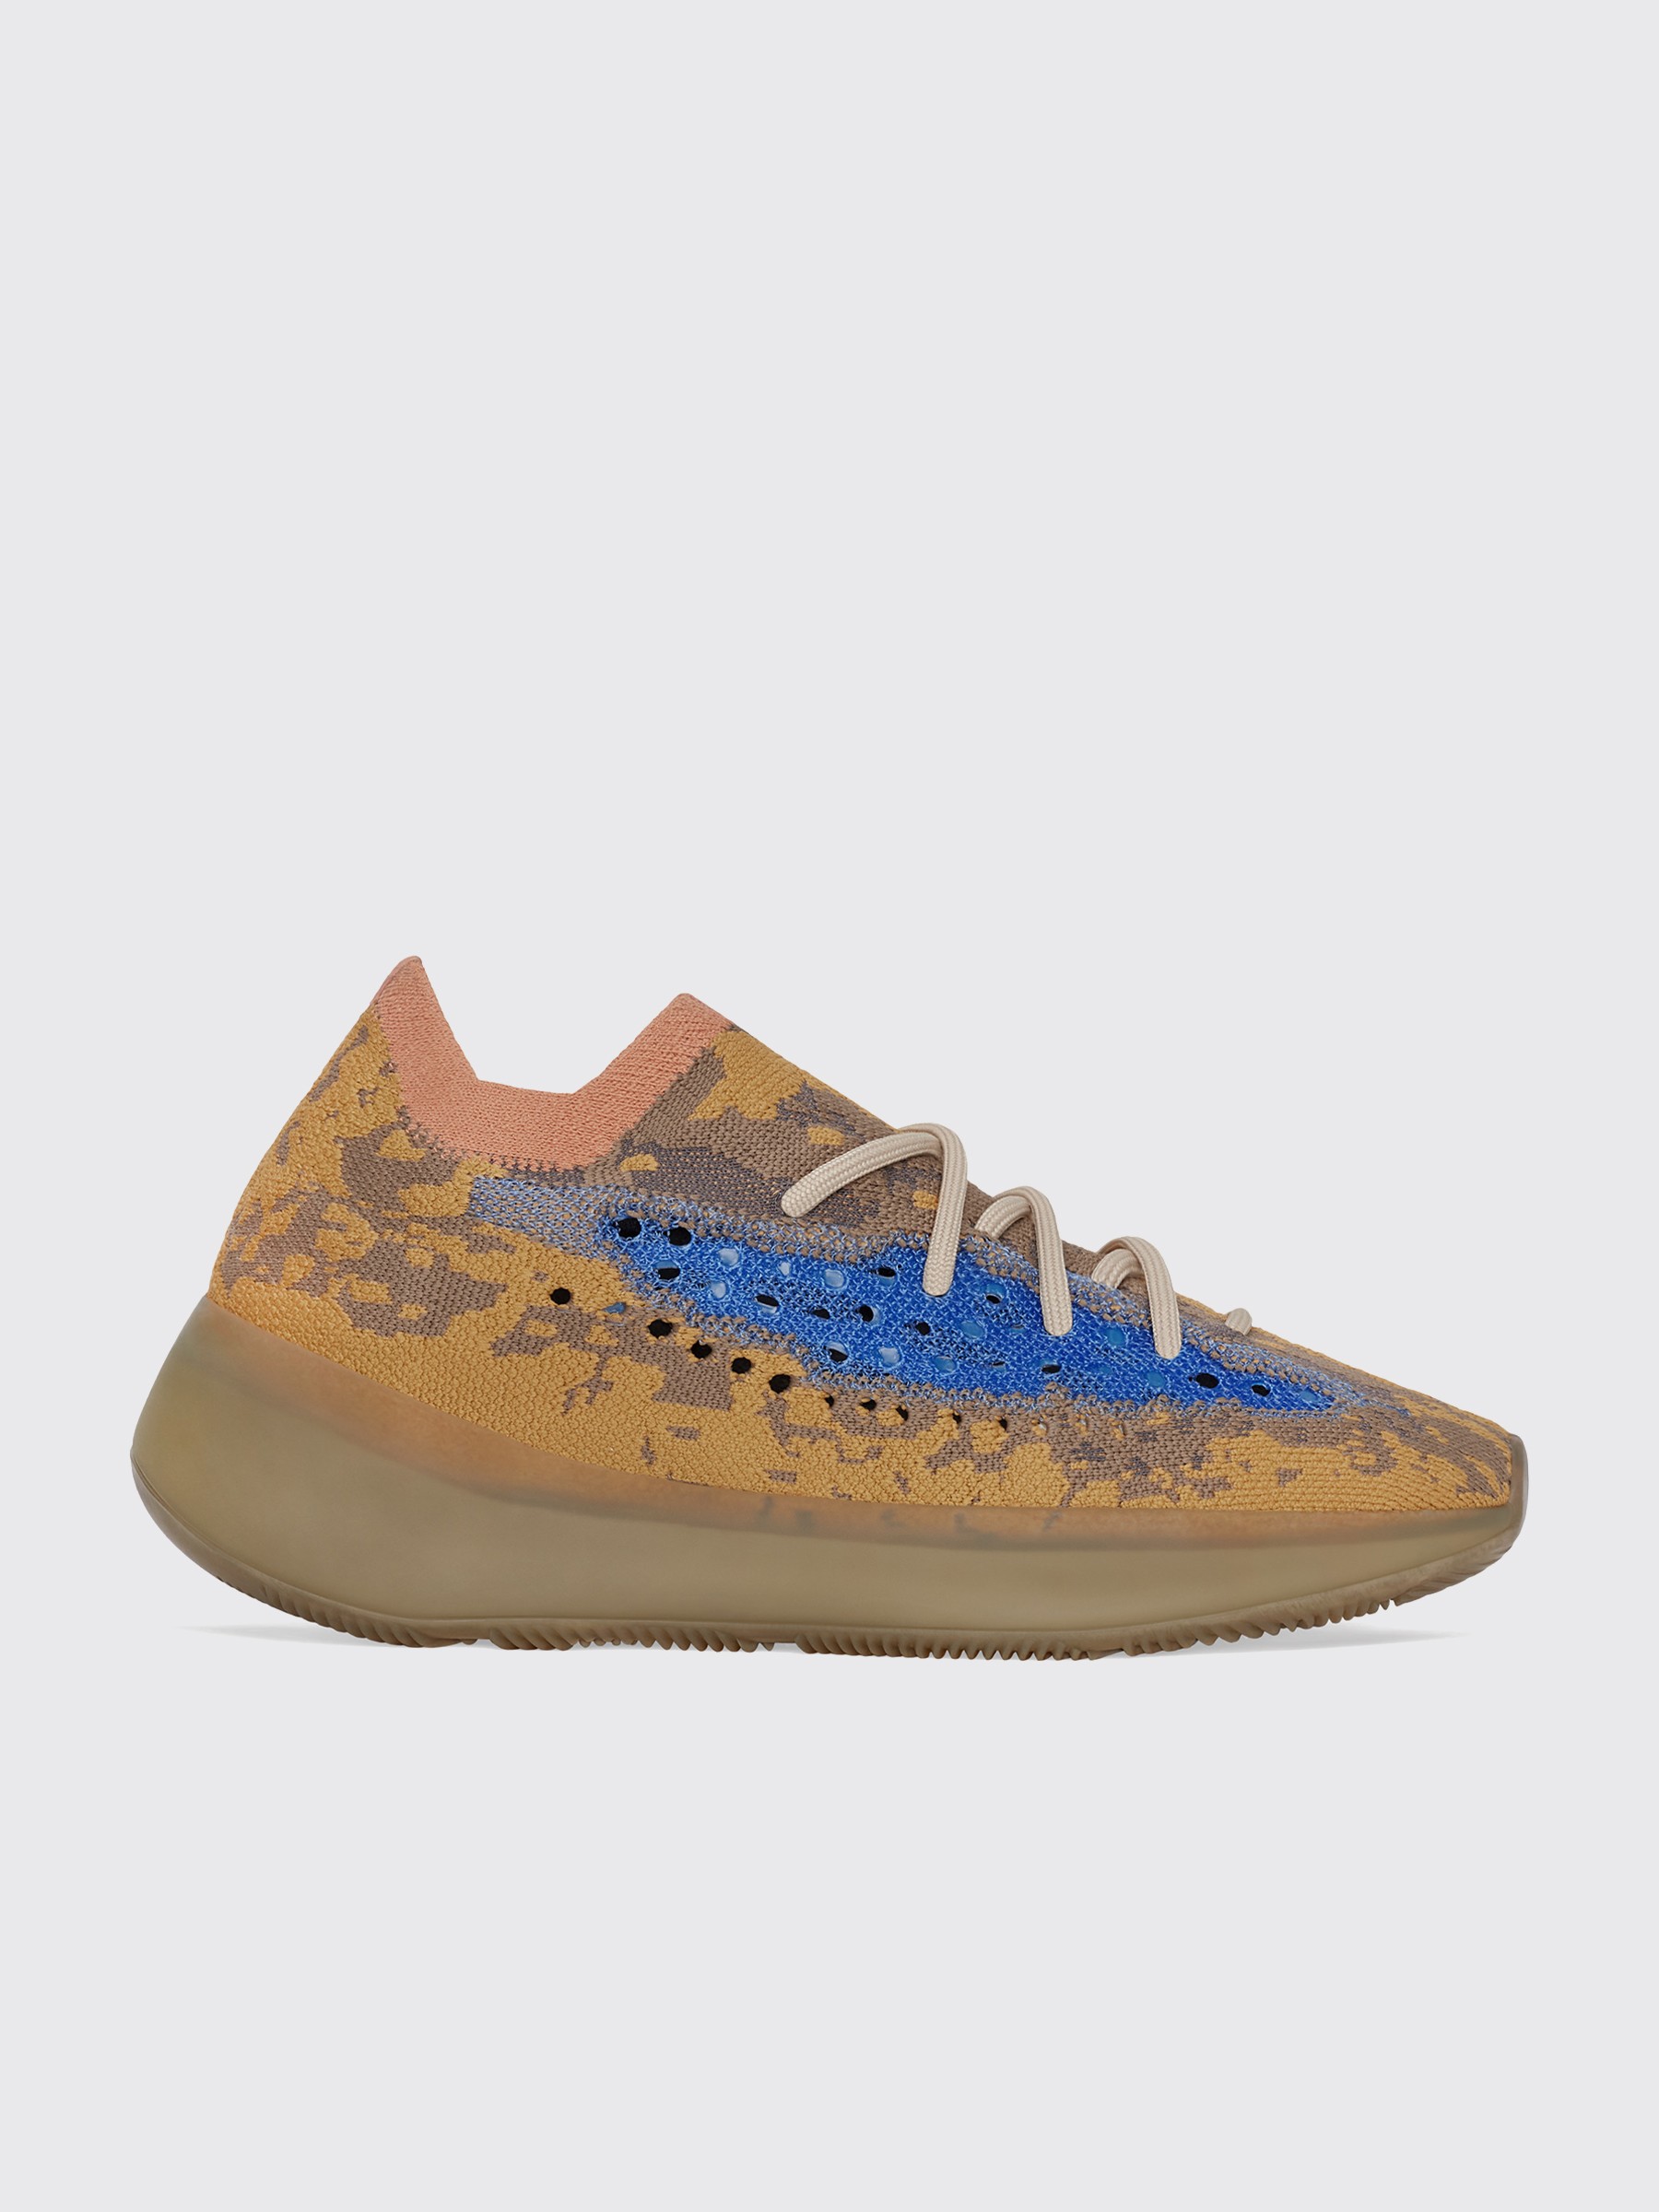 adidas yeezy blue